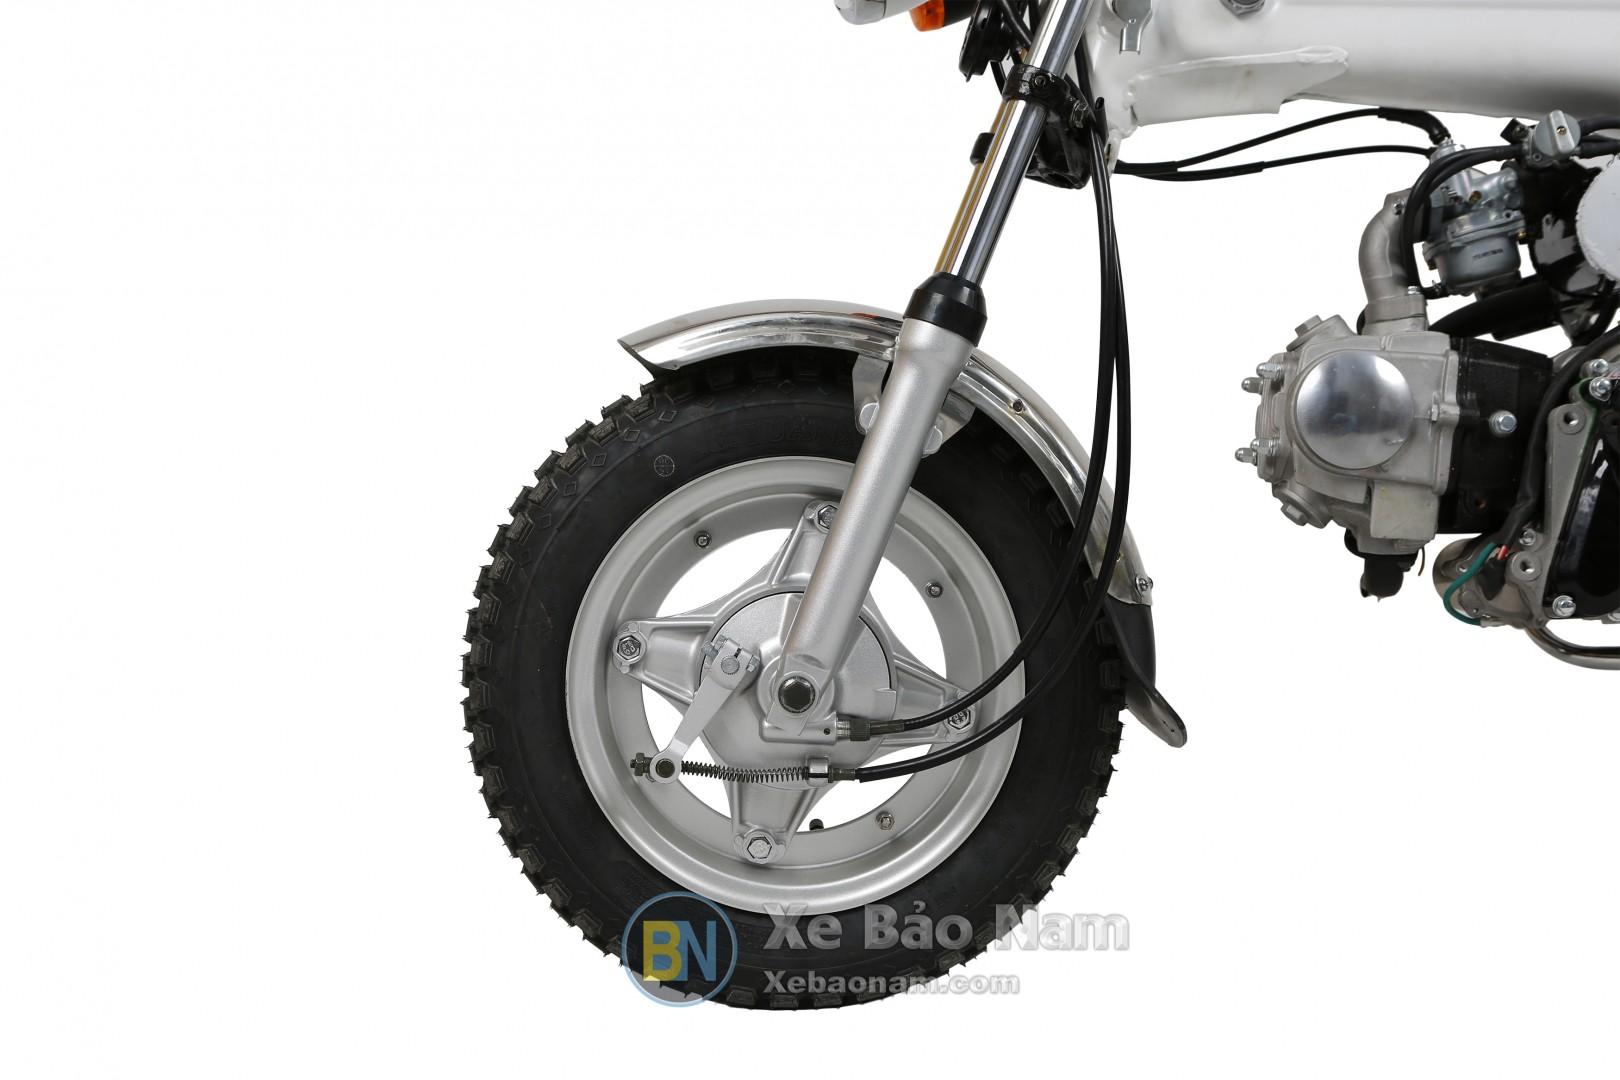 xe-honda-dax-50-xebaonam-7